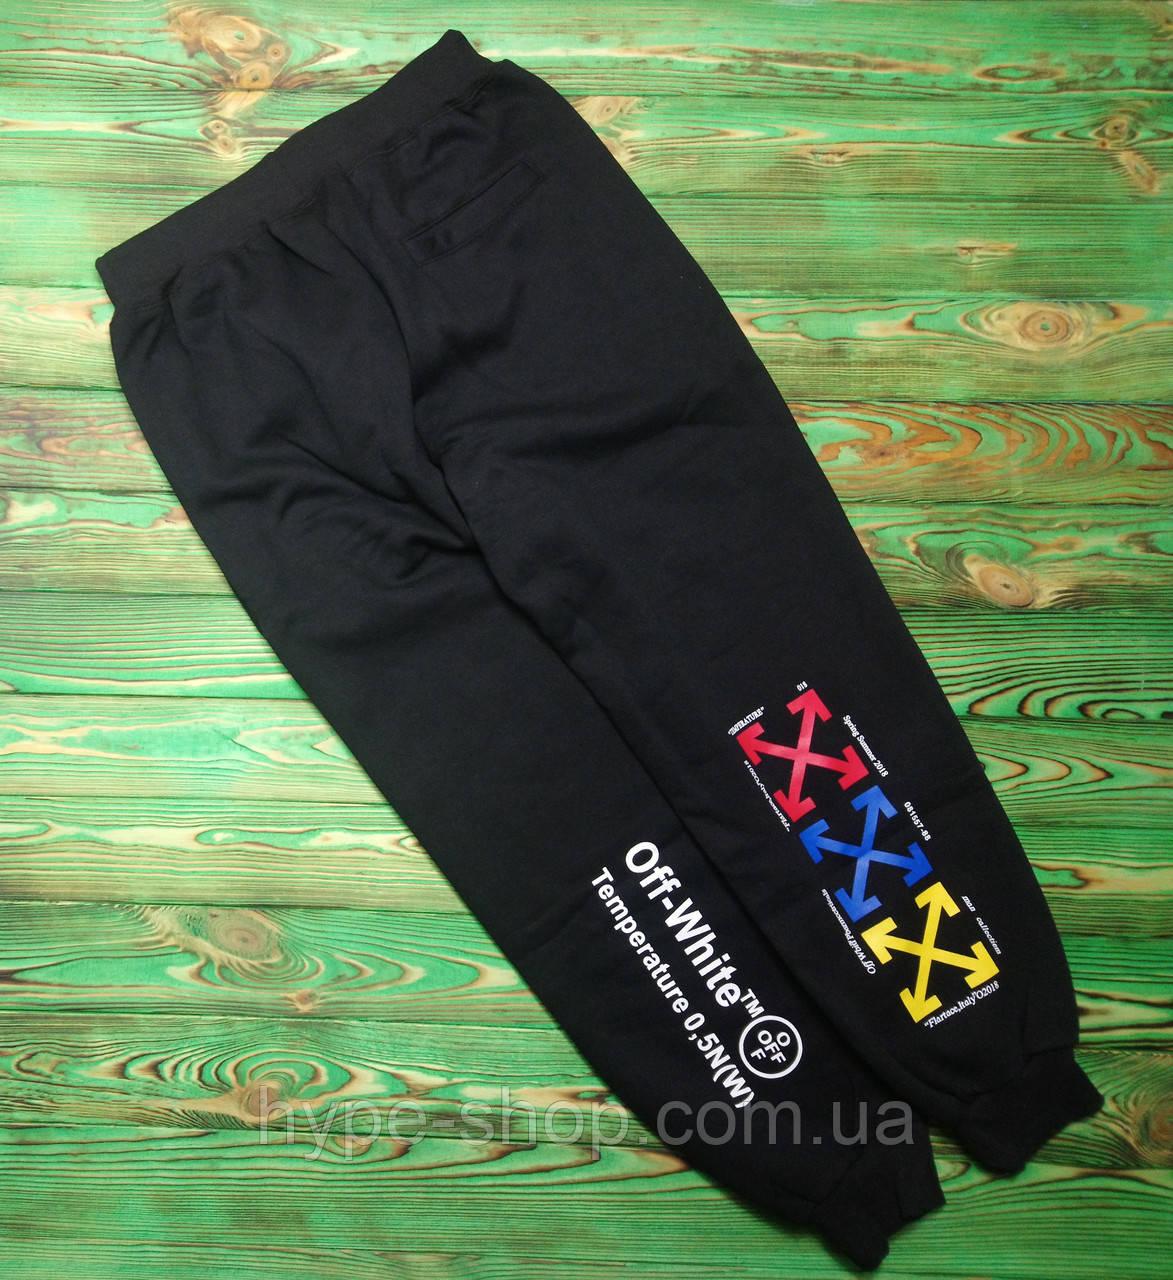 Мужские спортивные штаны OFF White реплика